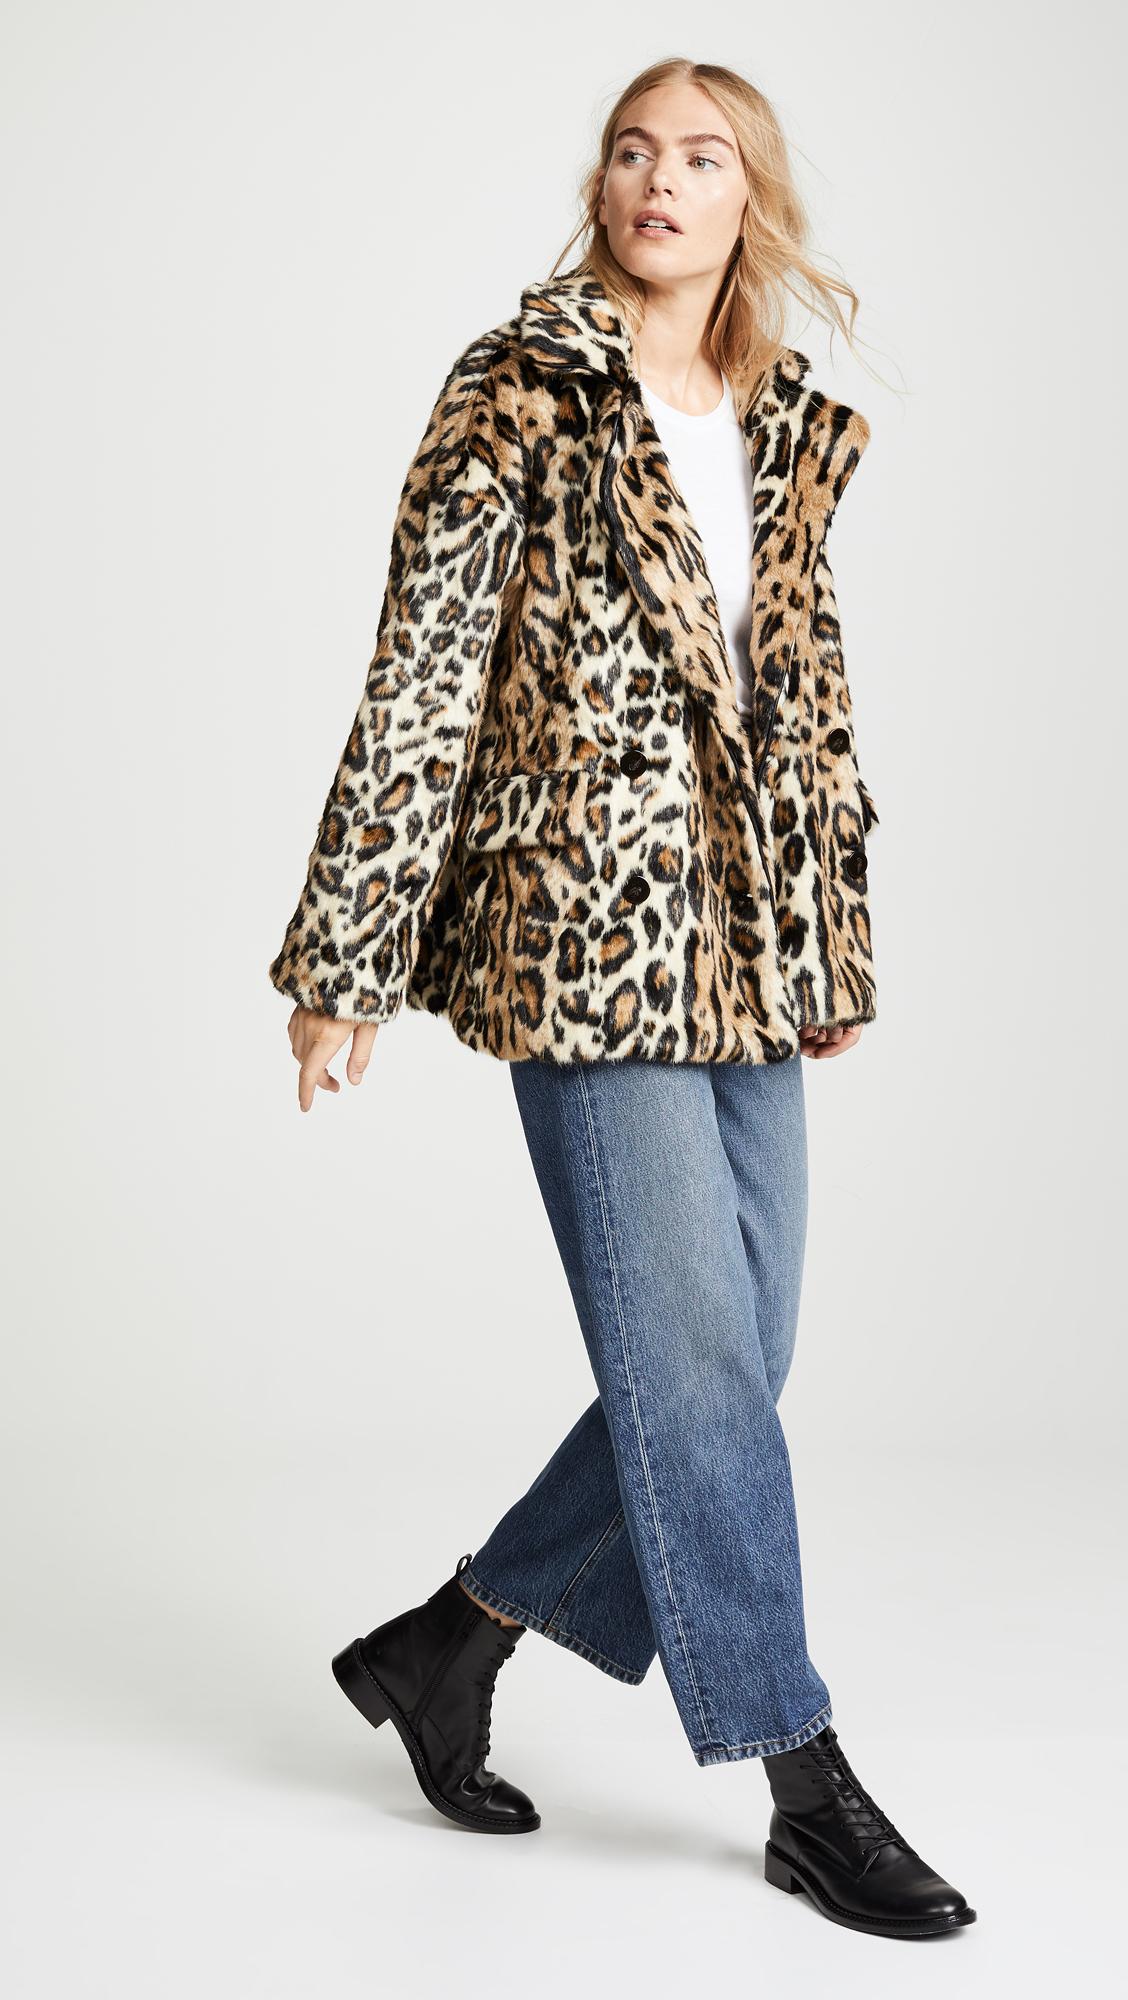 51dba6f500e5 Free People Kate Leopard Coat